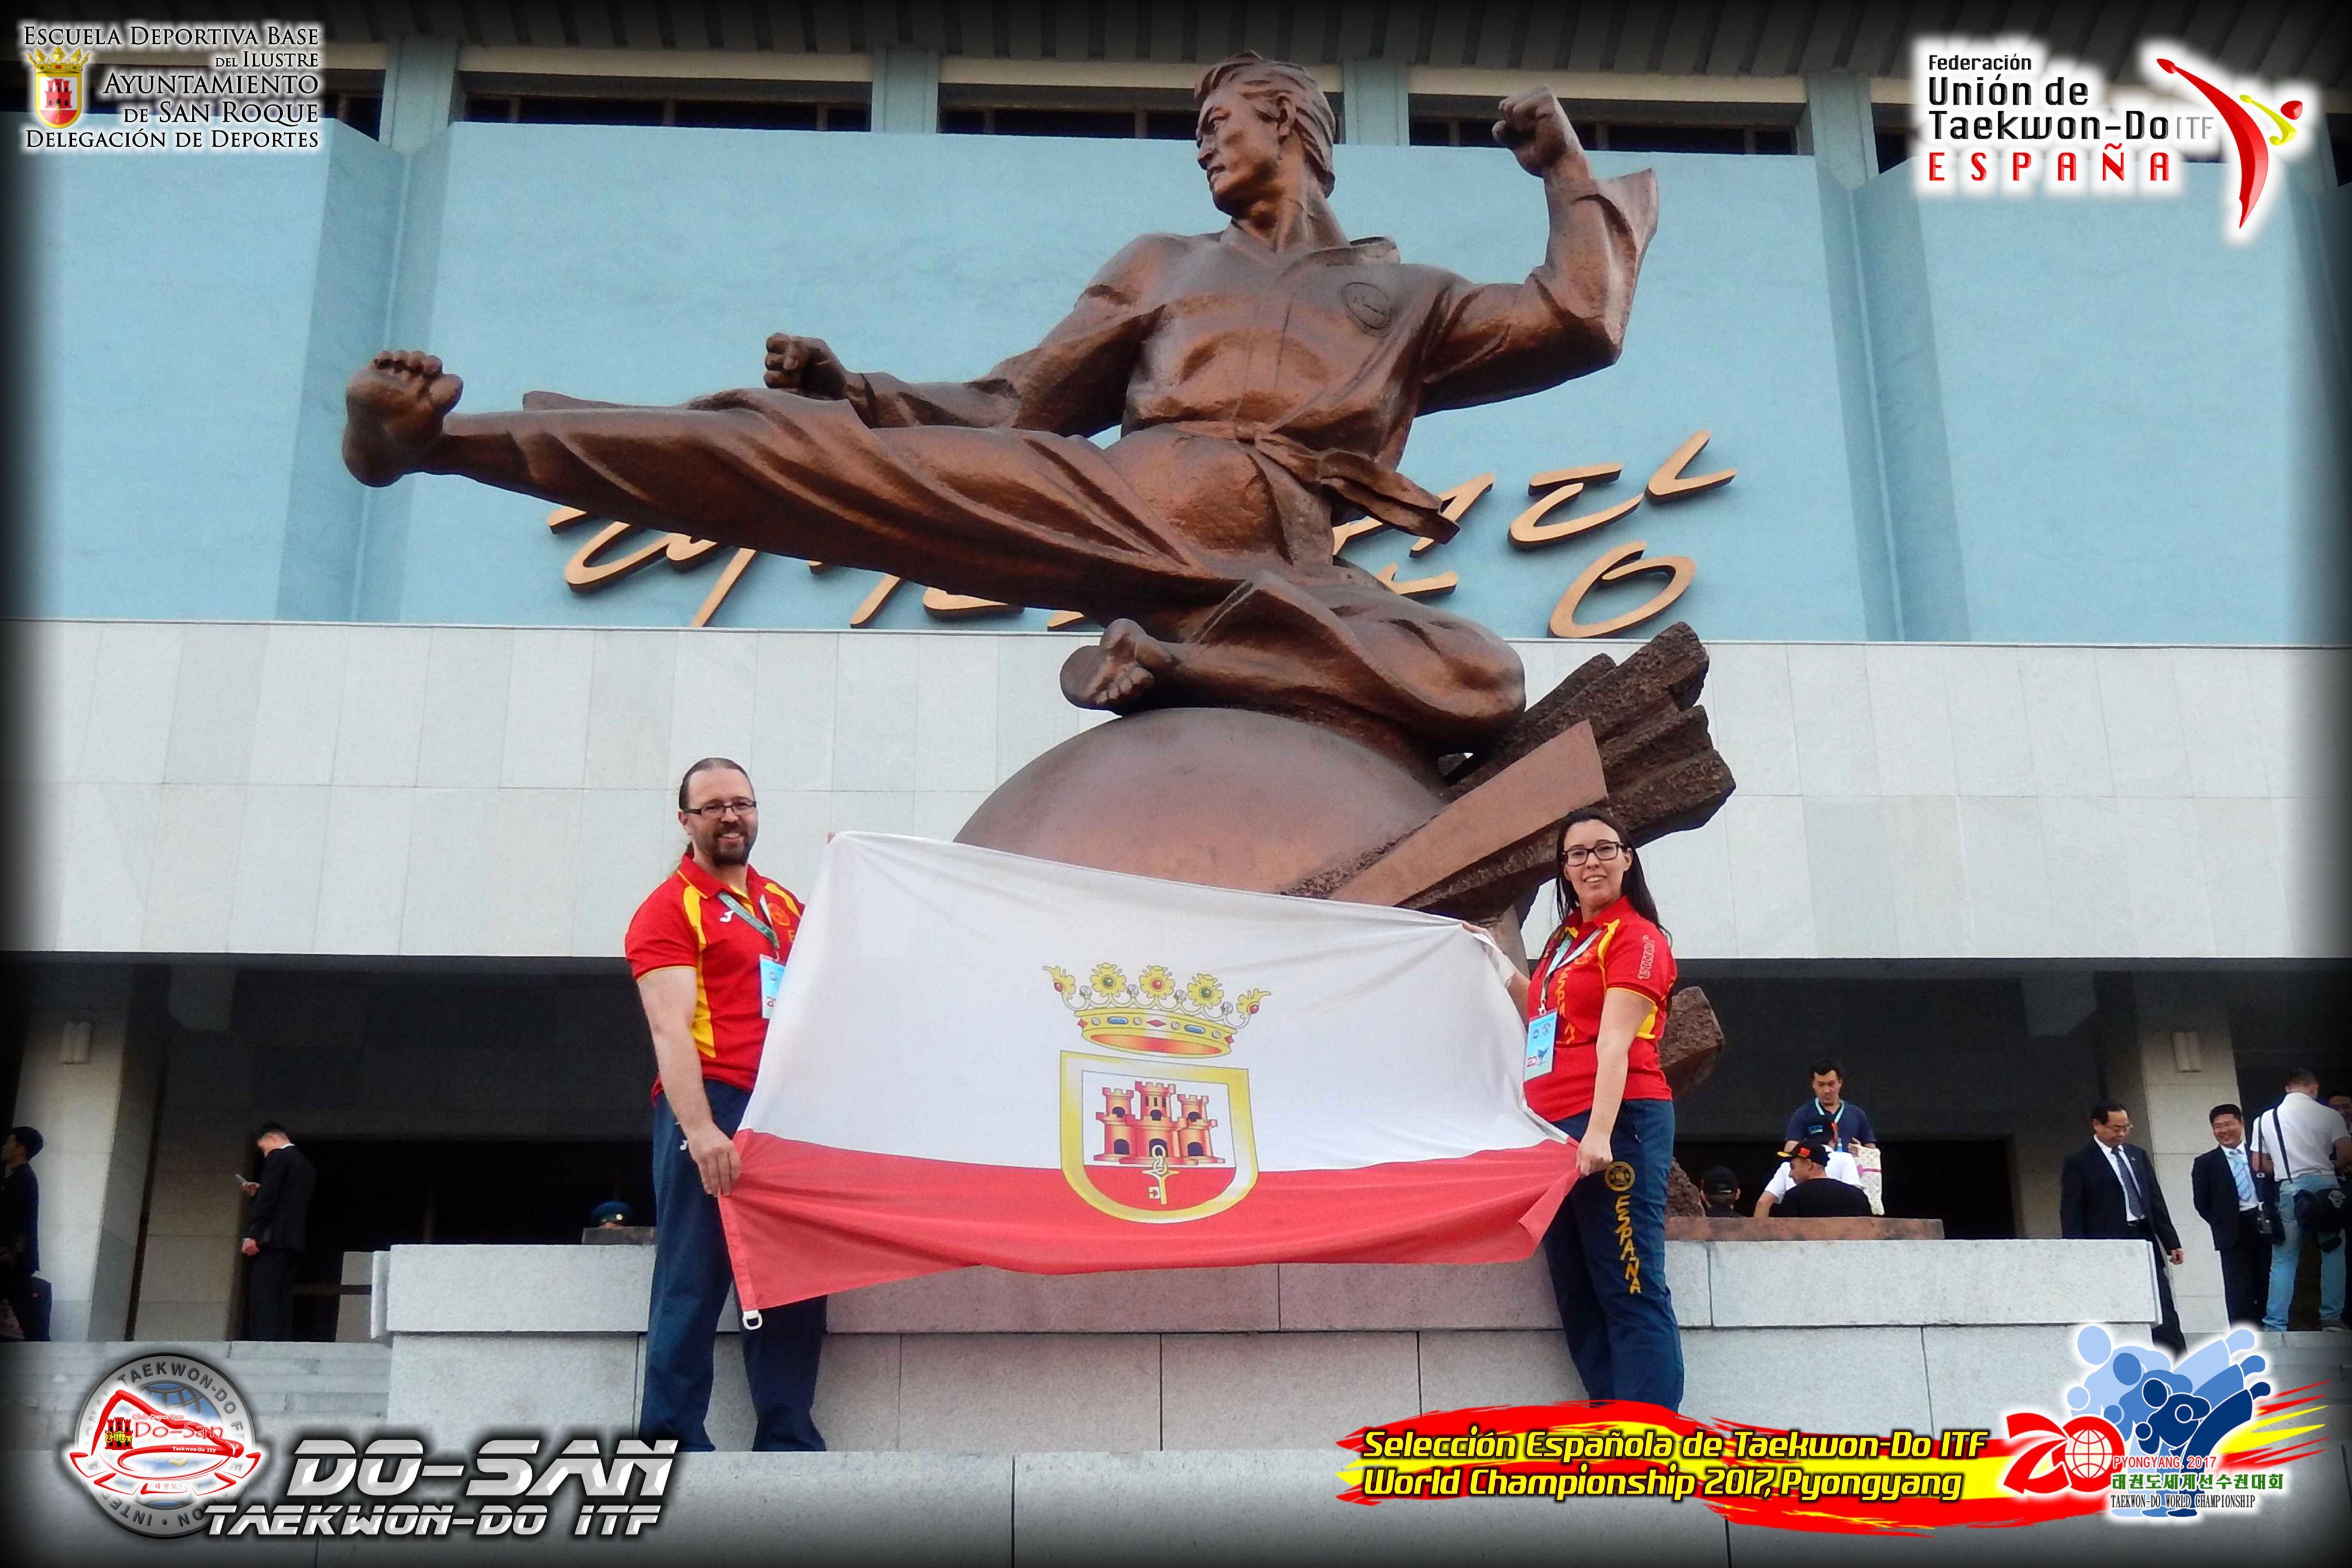 El C.D. Do-San reanuda sus clases de Taekwon-Do ITF | San Roque